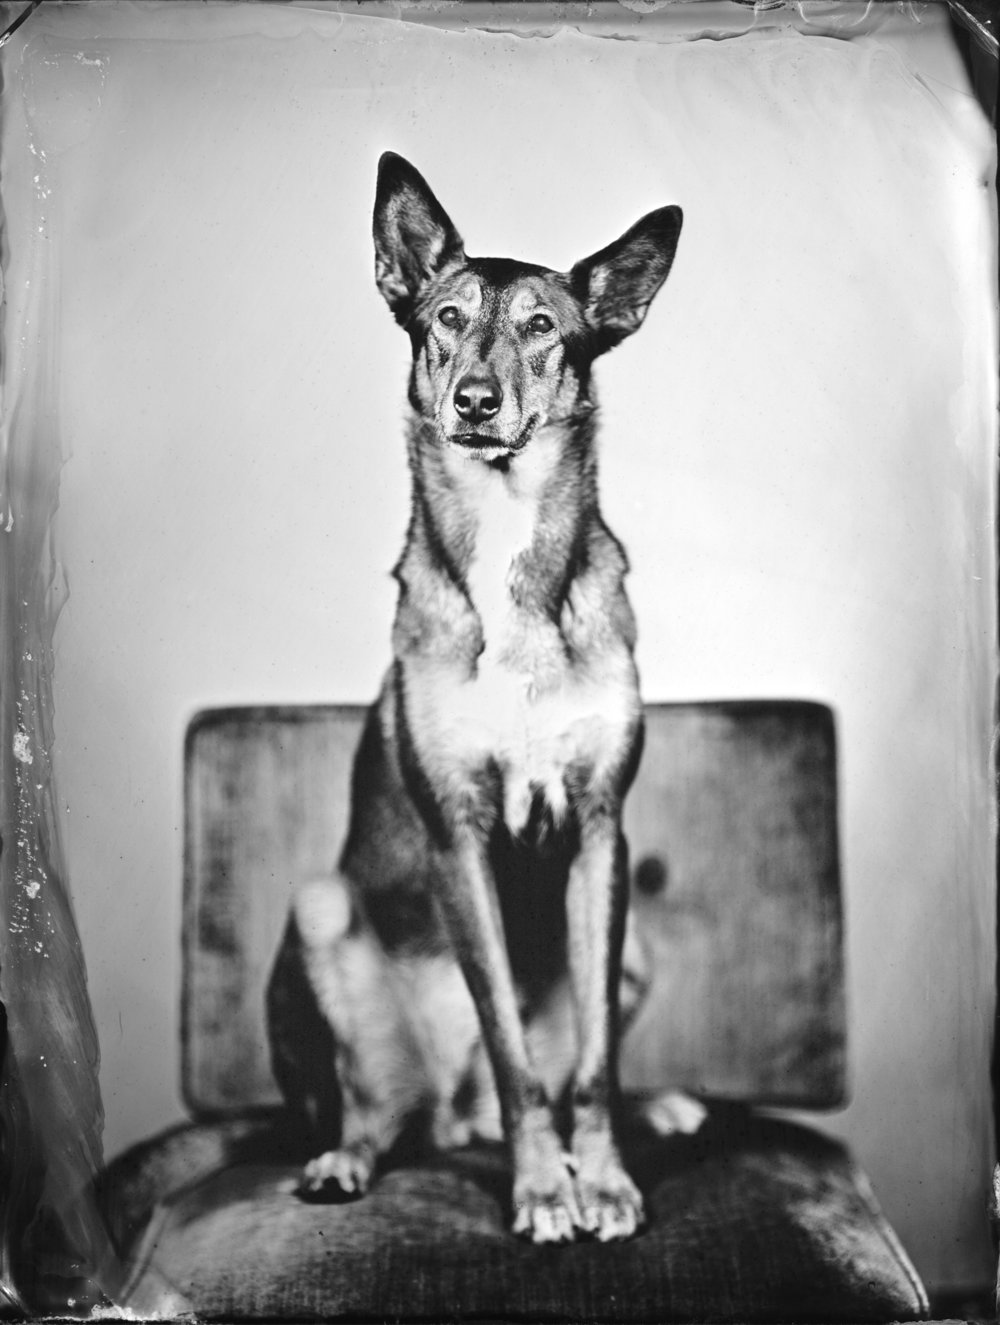 Medium-*$69, Large-$89 for 1 Pet Tintype -